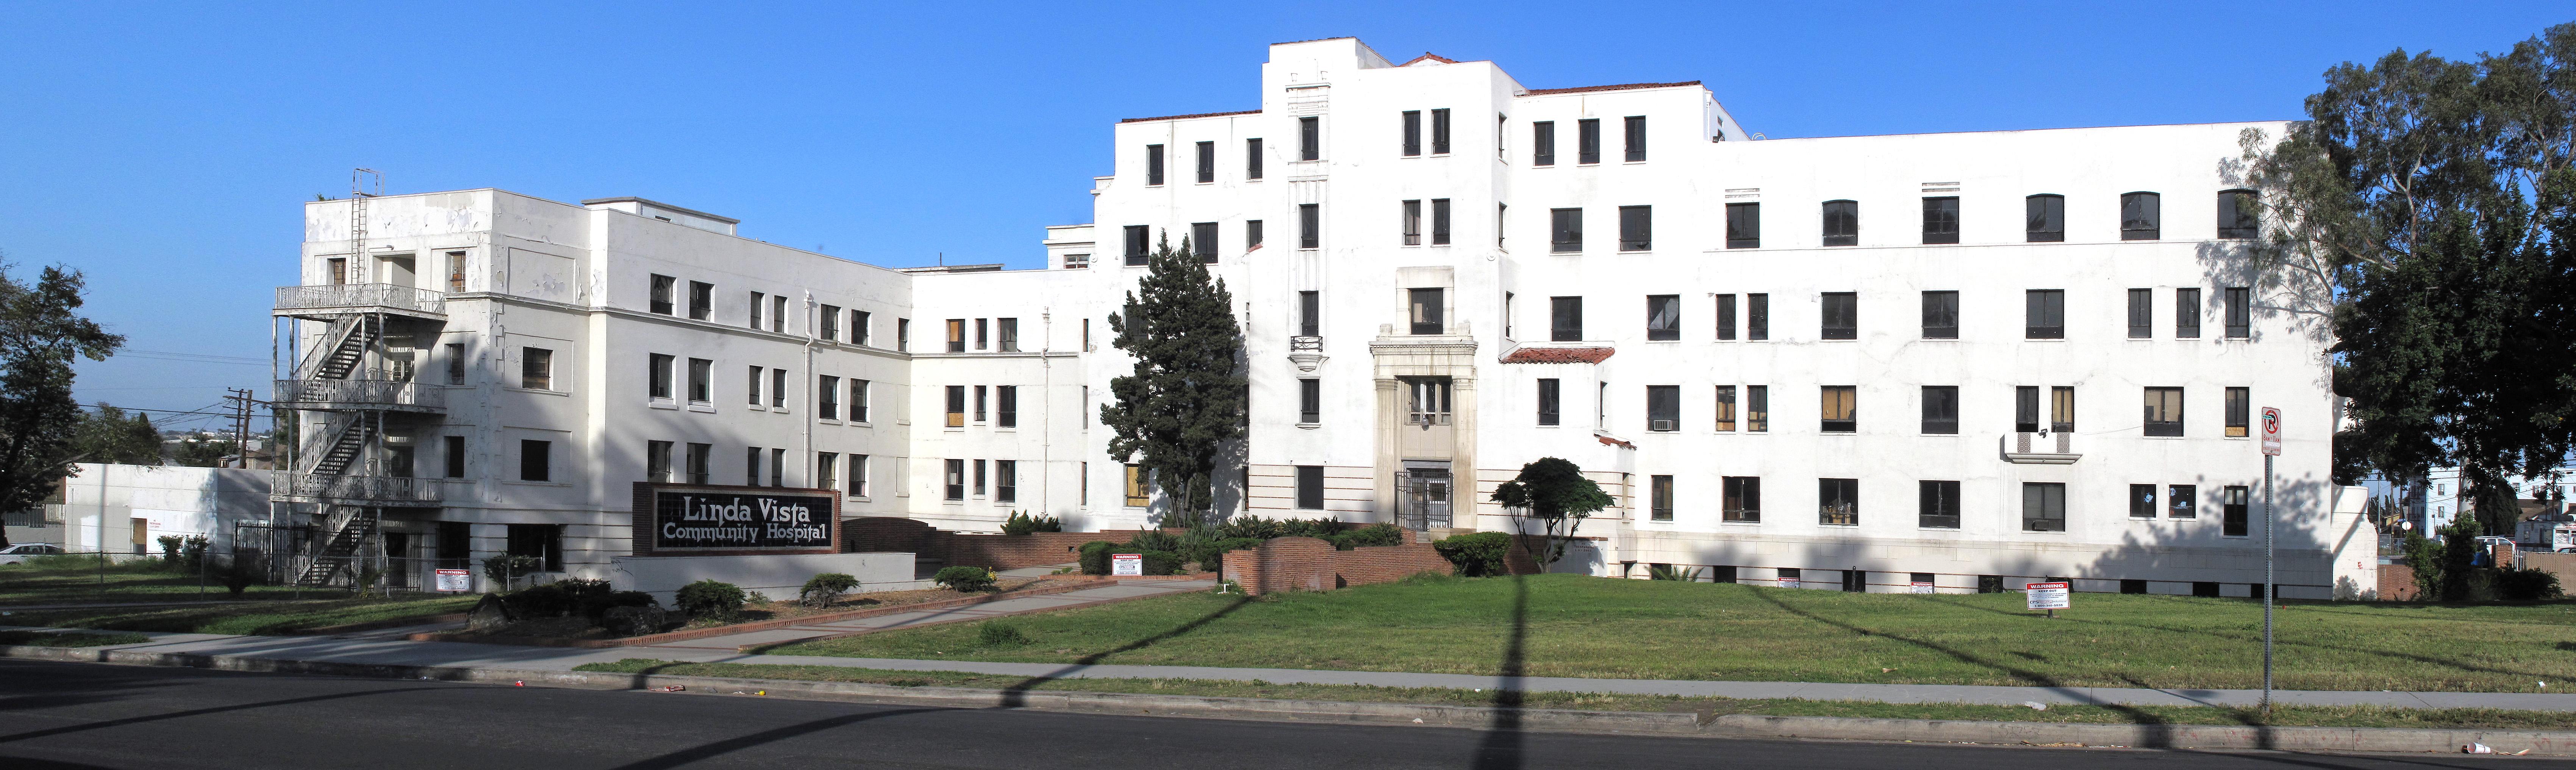 File Linda Vista Community Hospital Building Los Angeles Jpg Wikimedia Commons